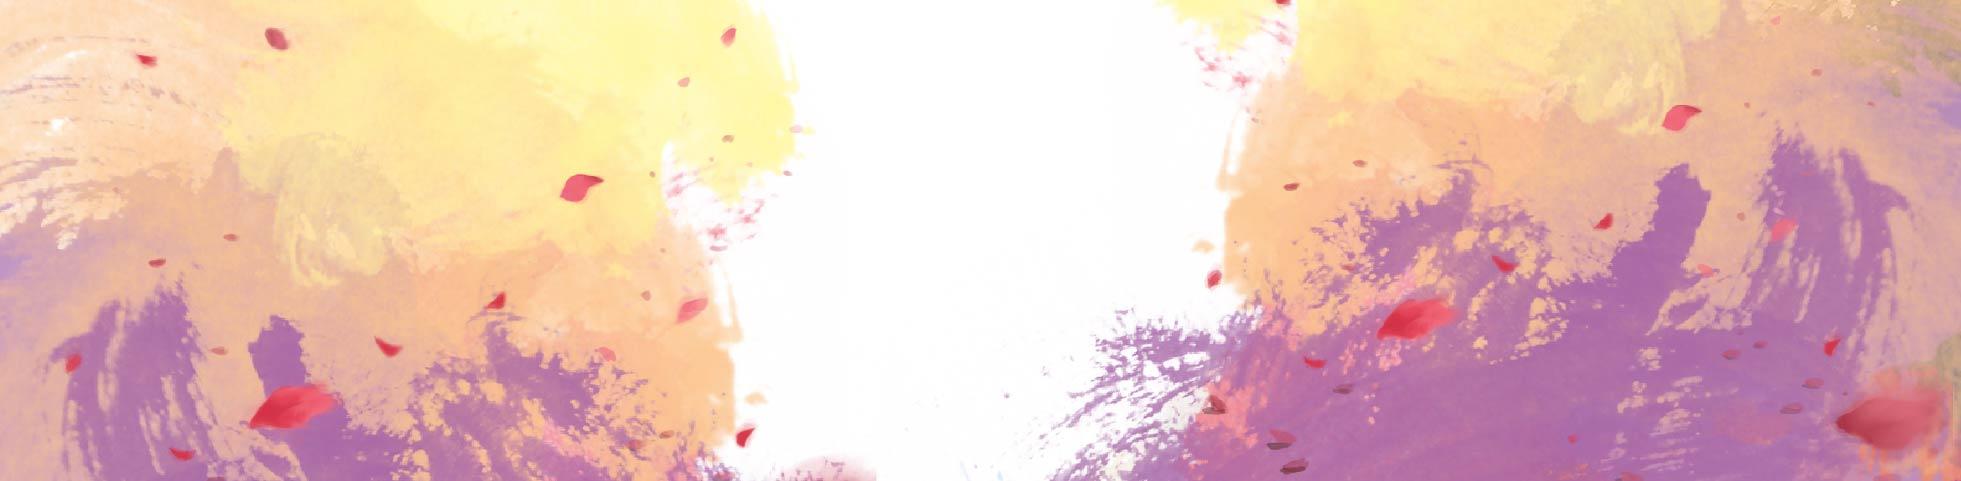 bg01_Artboard 23 copy